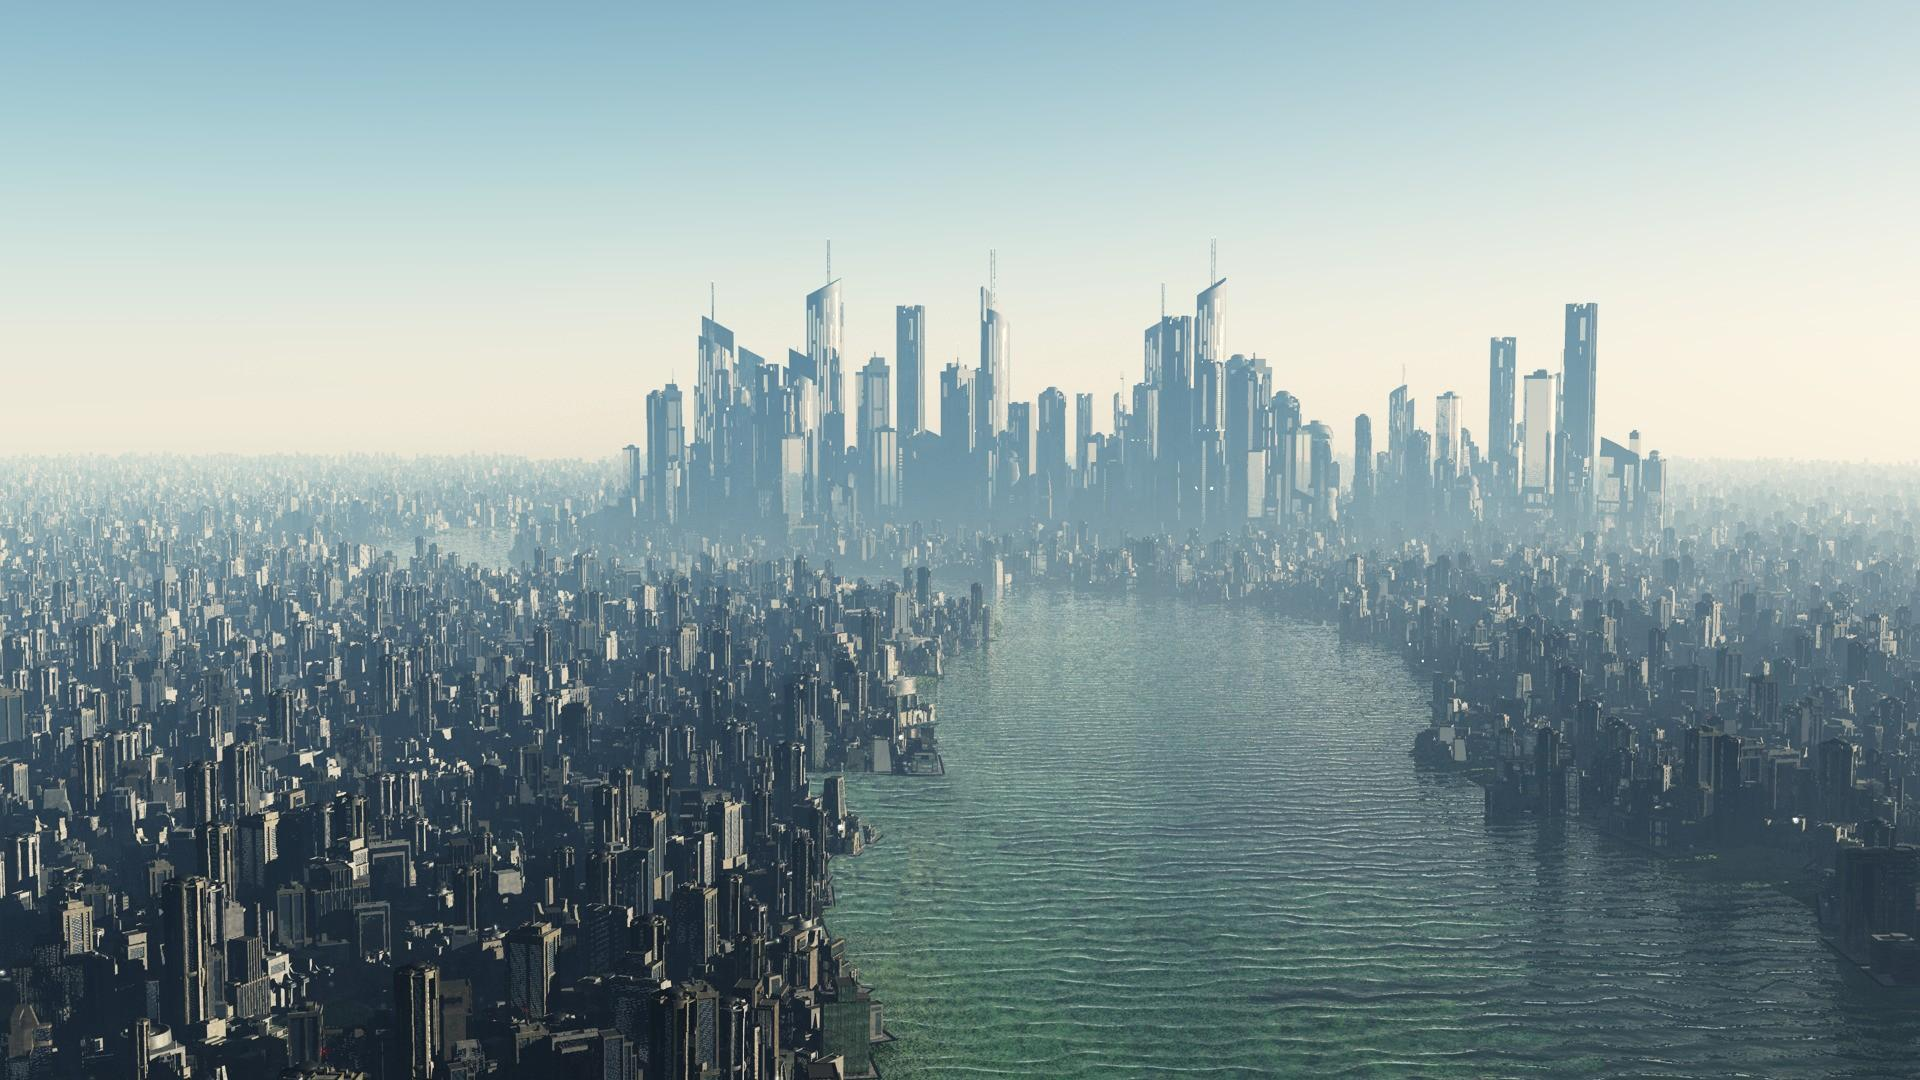 city skyline wallpaper